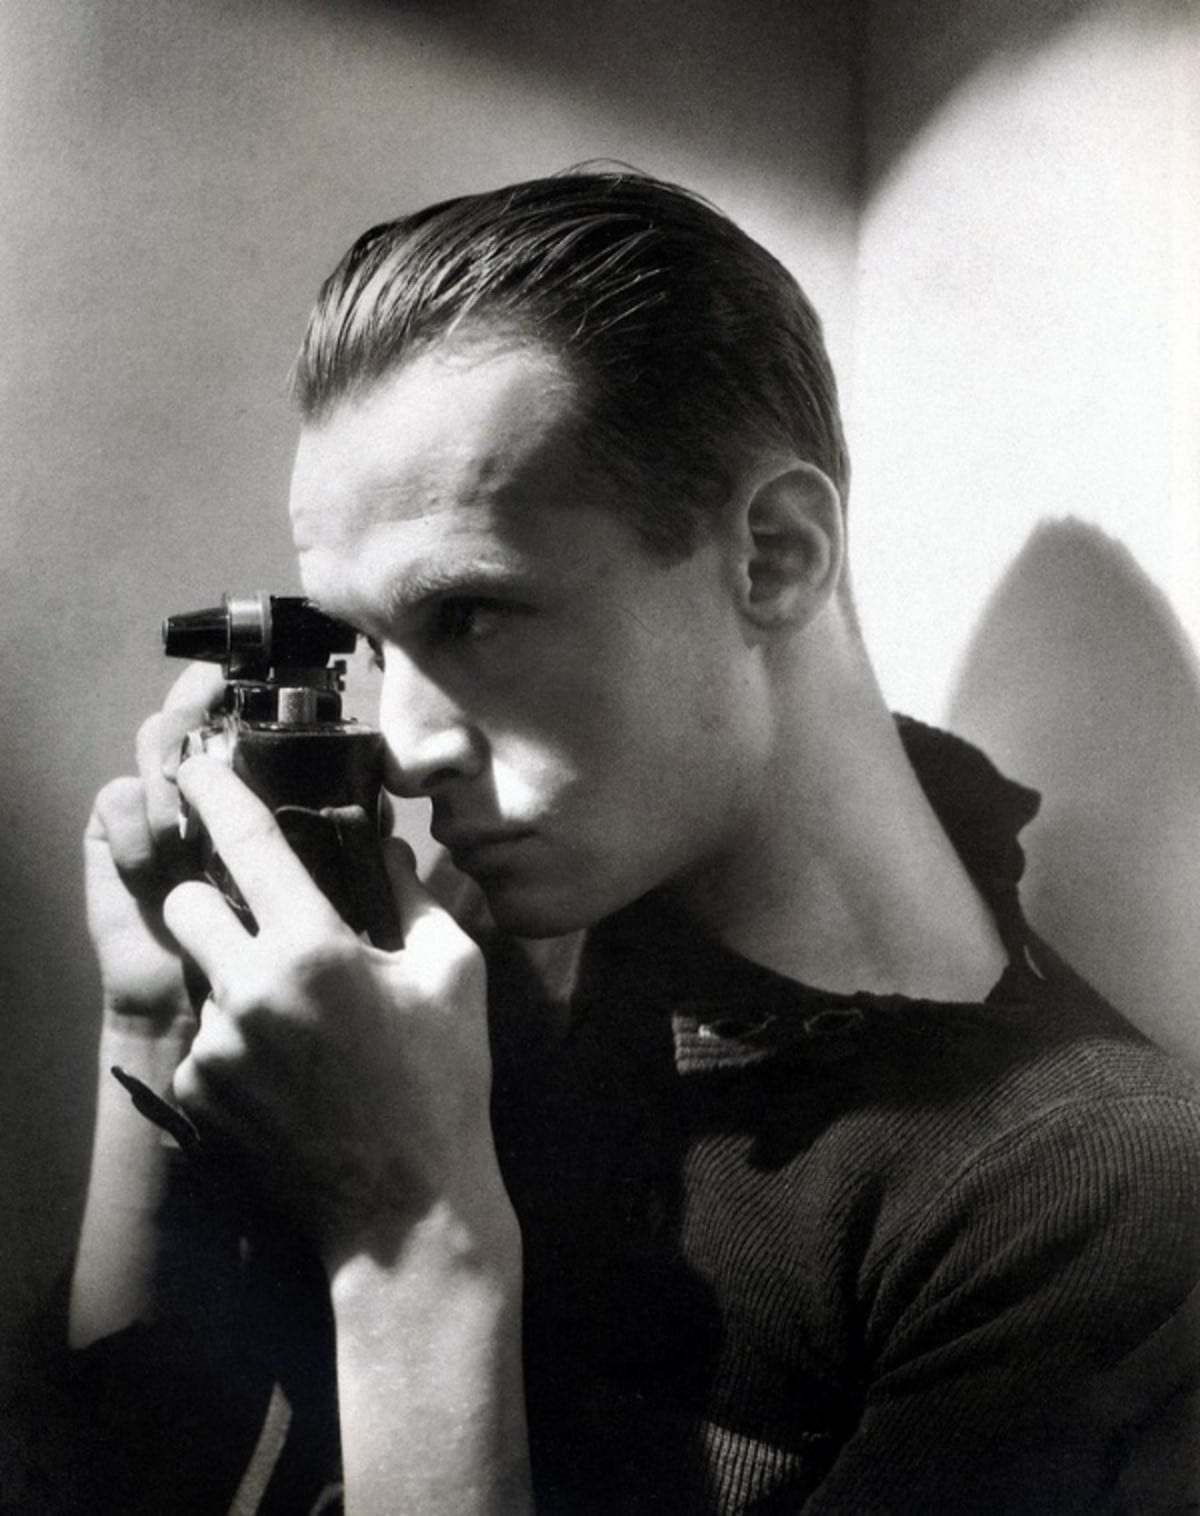 fotógrafo blanco y negro